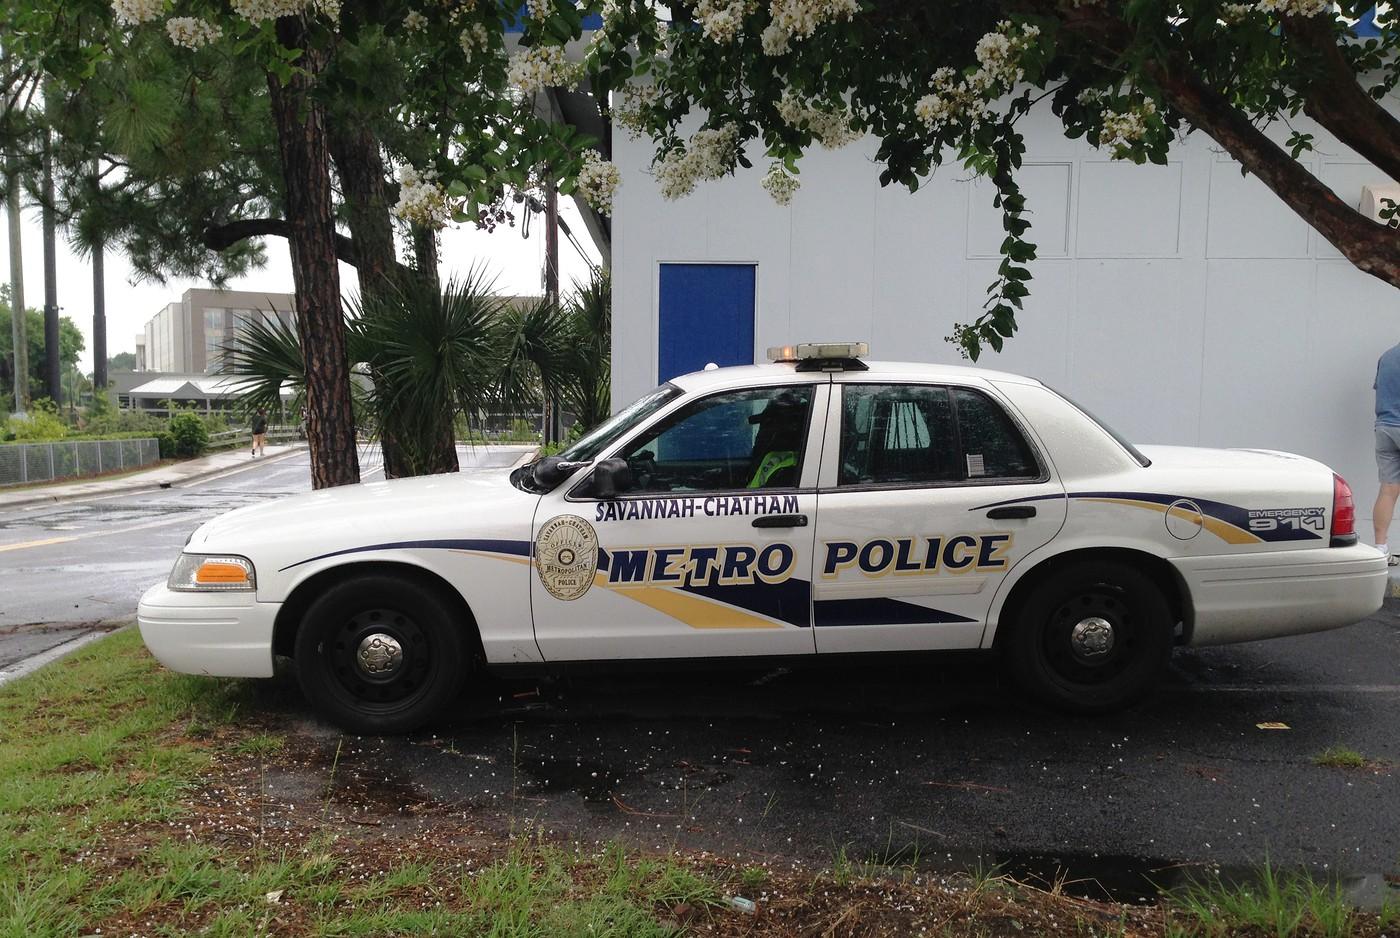 GA - Savannah-Chatham Metro Police